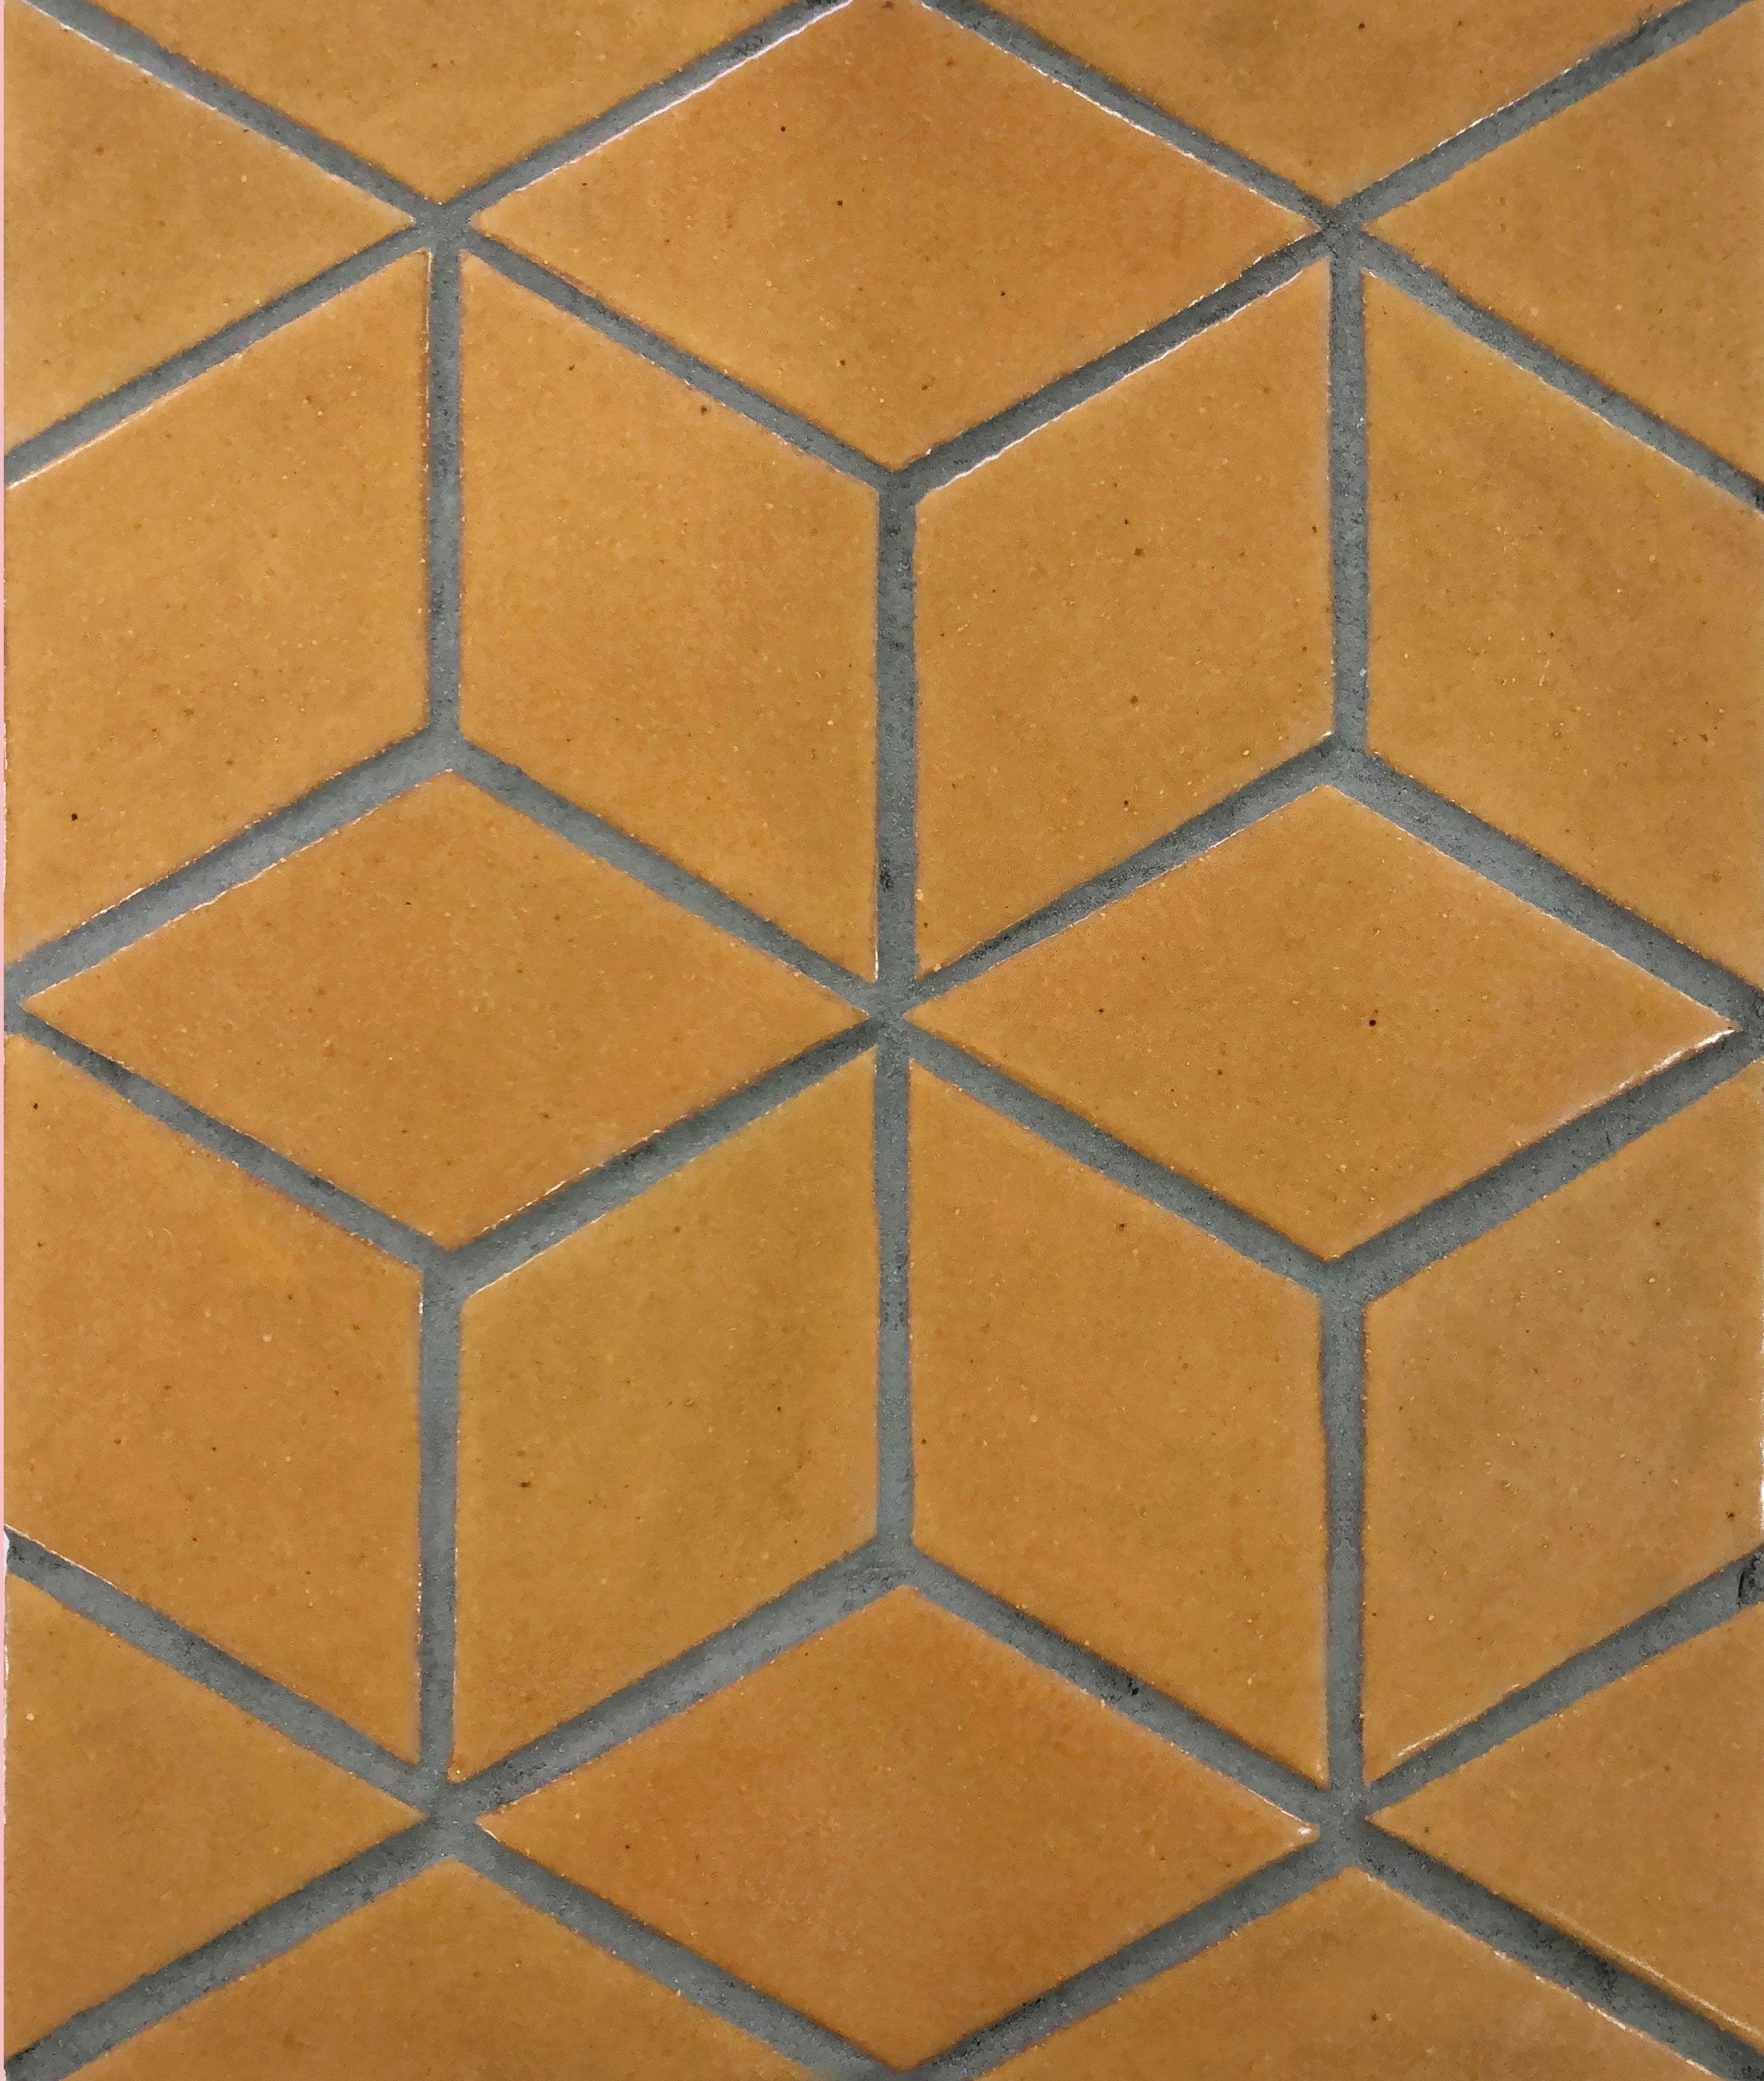 Diamond Tile Diamond Tile Patterned Bathroom Tiles Tile Patterns